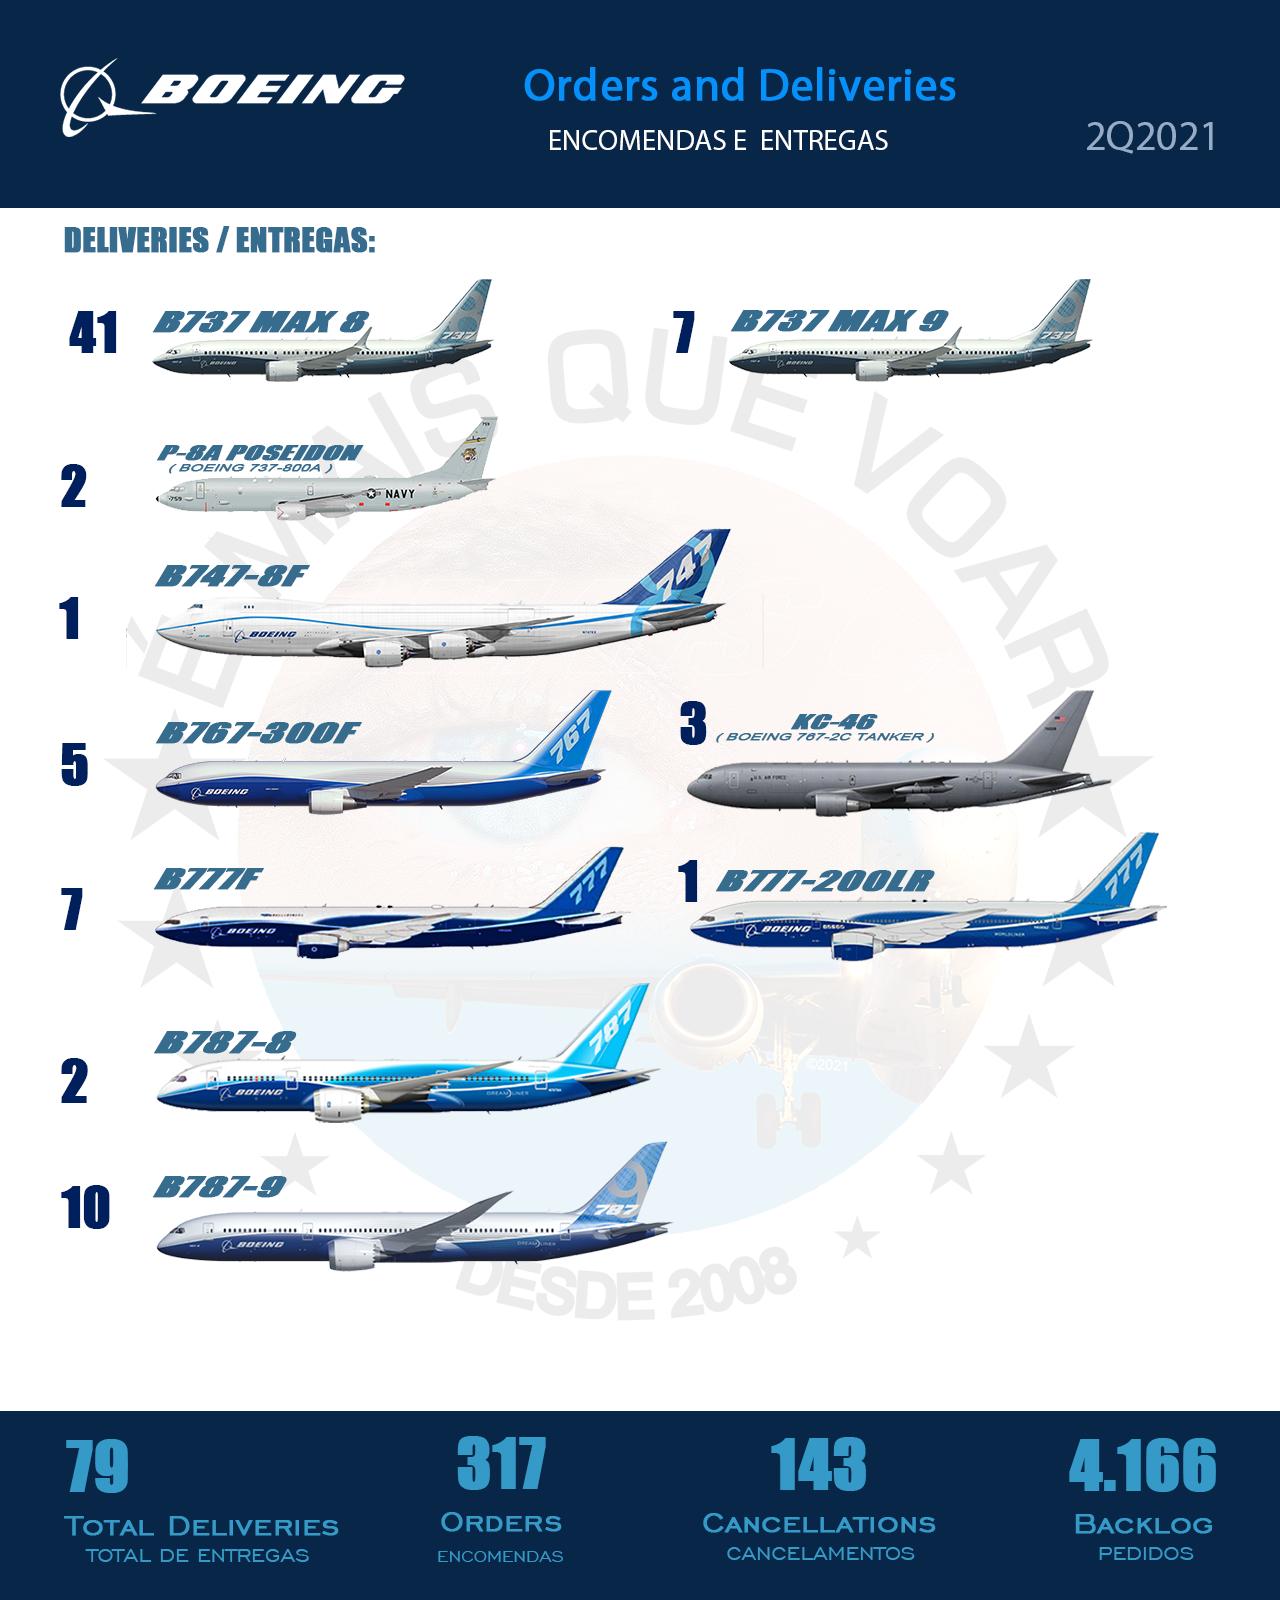 Boeing - entregas de aeronaves no Segundo Trimestre de 2021 (2T2021)